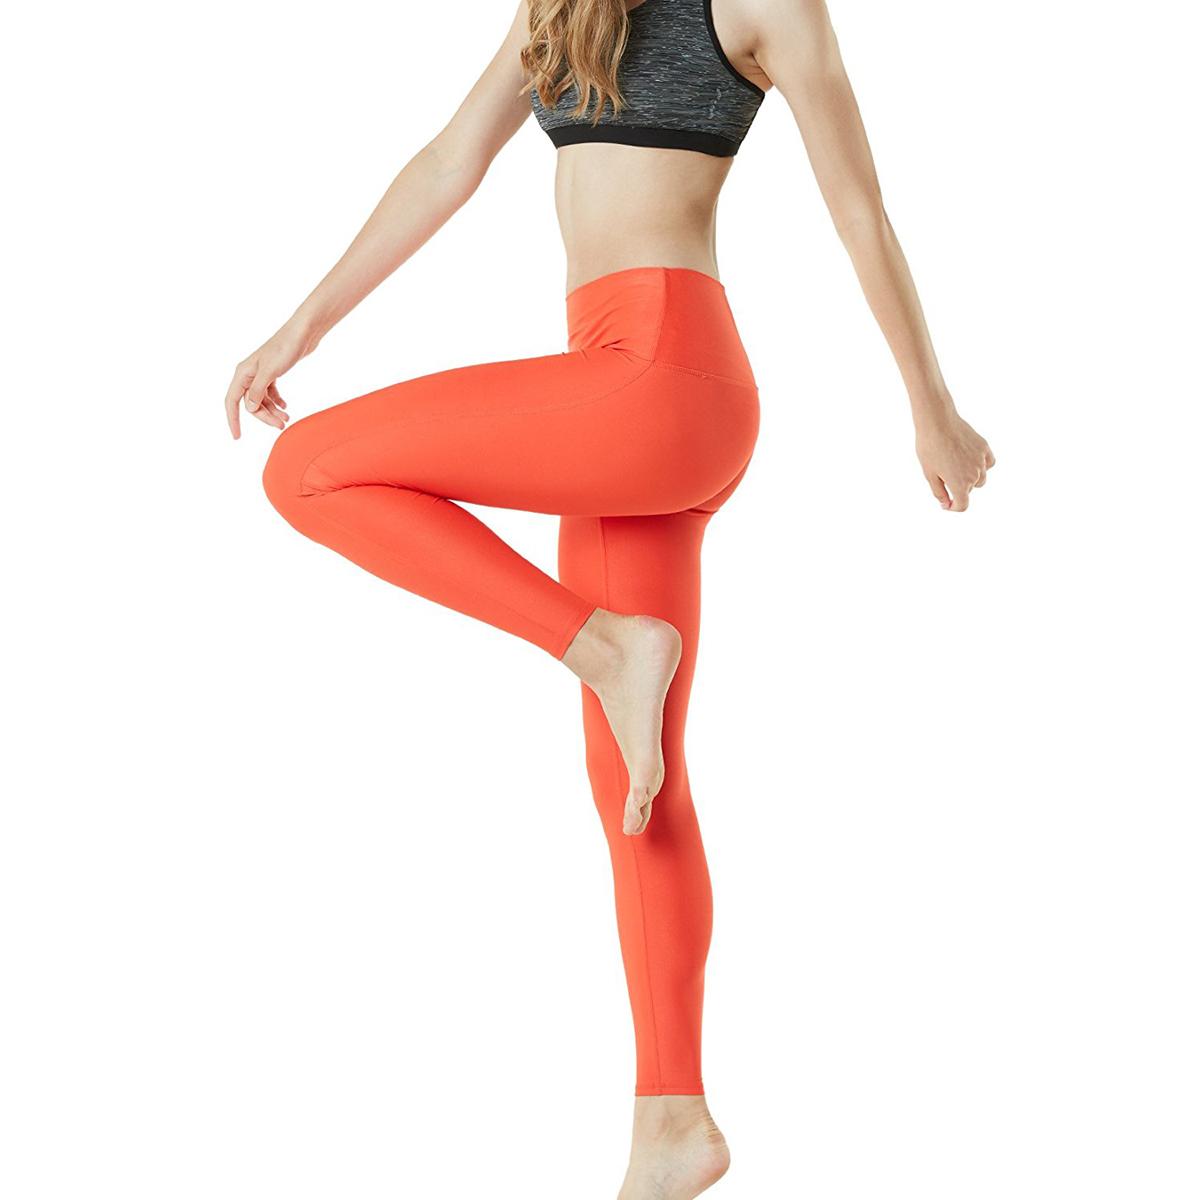 thumbnail 60 - TSLA Tesla FYP42 Women's High-Waisted Ultra-Stretch Tummy Control Yoga Pants